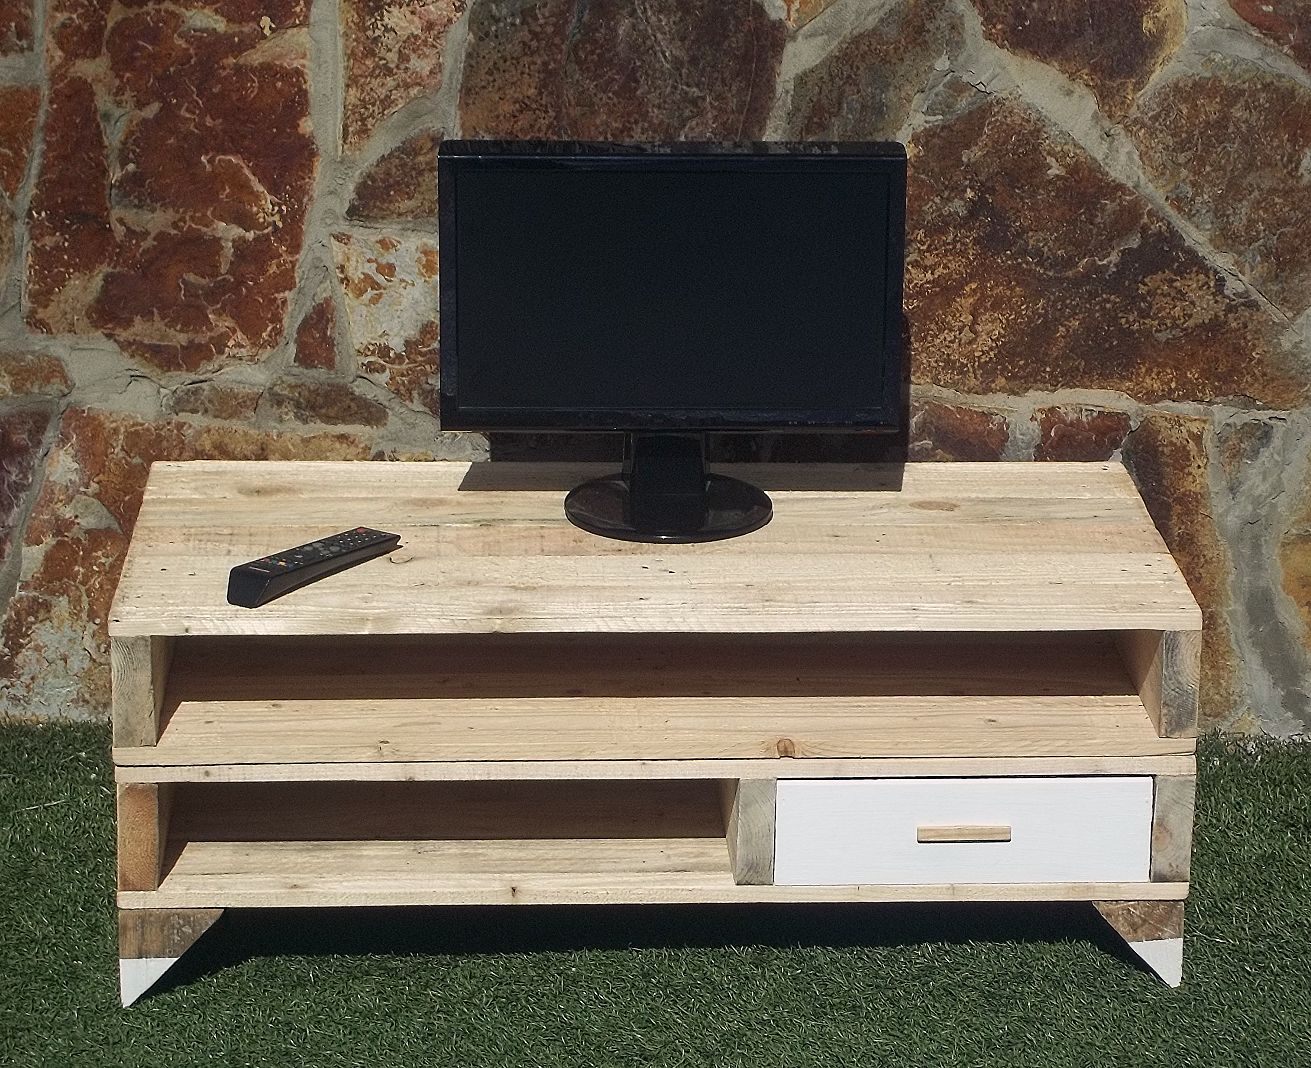 Mueble tv hecho con palets gohan for Fabricacion de muebles de palets de madera